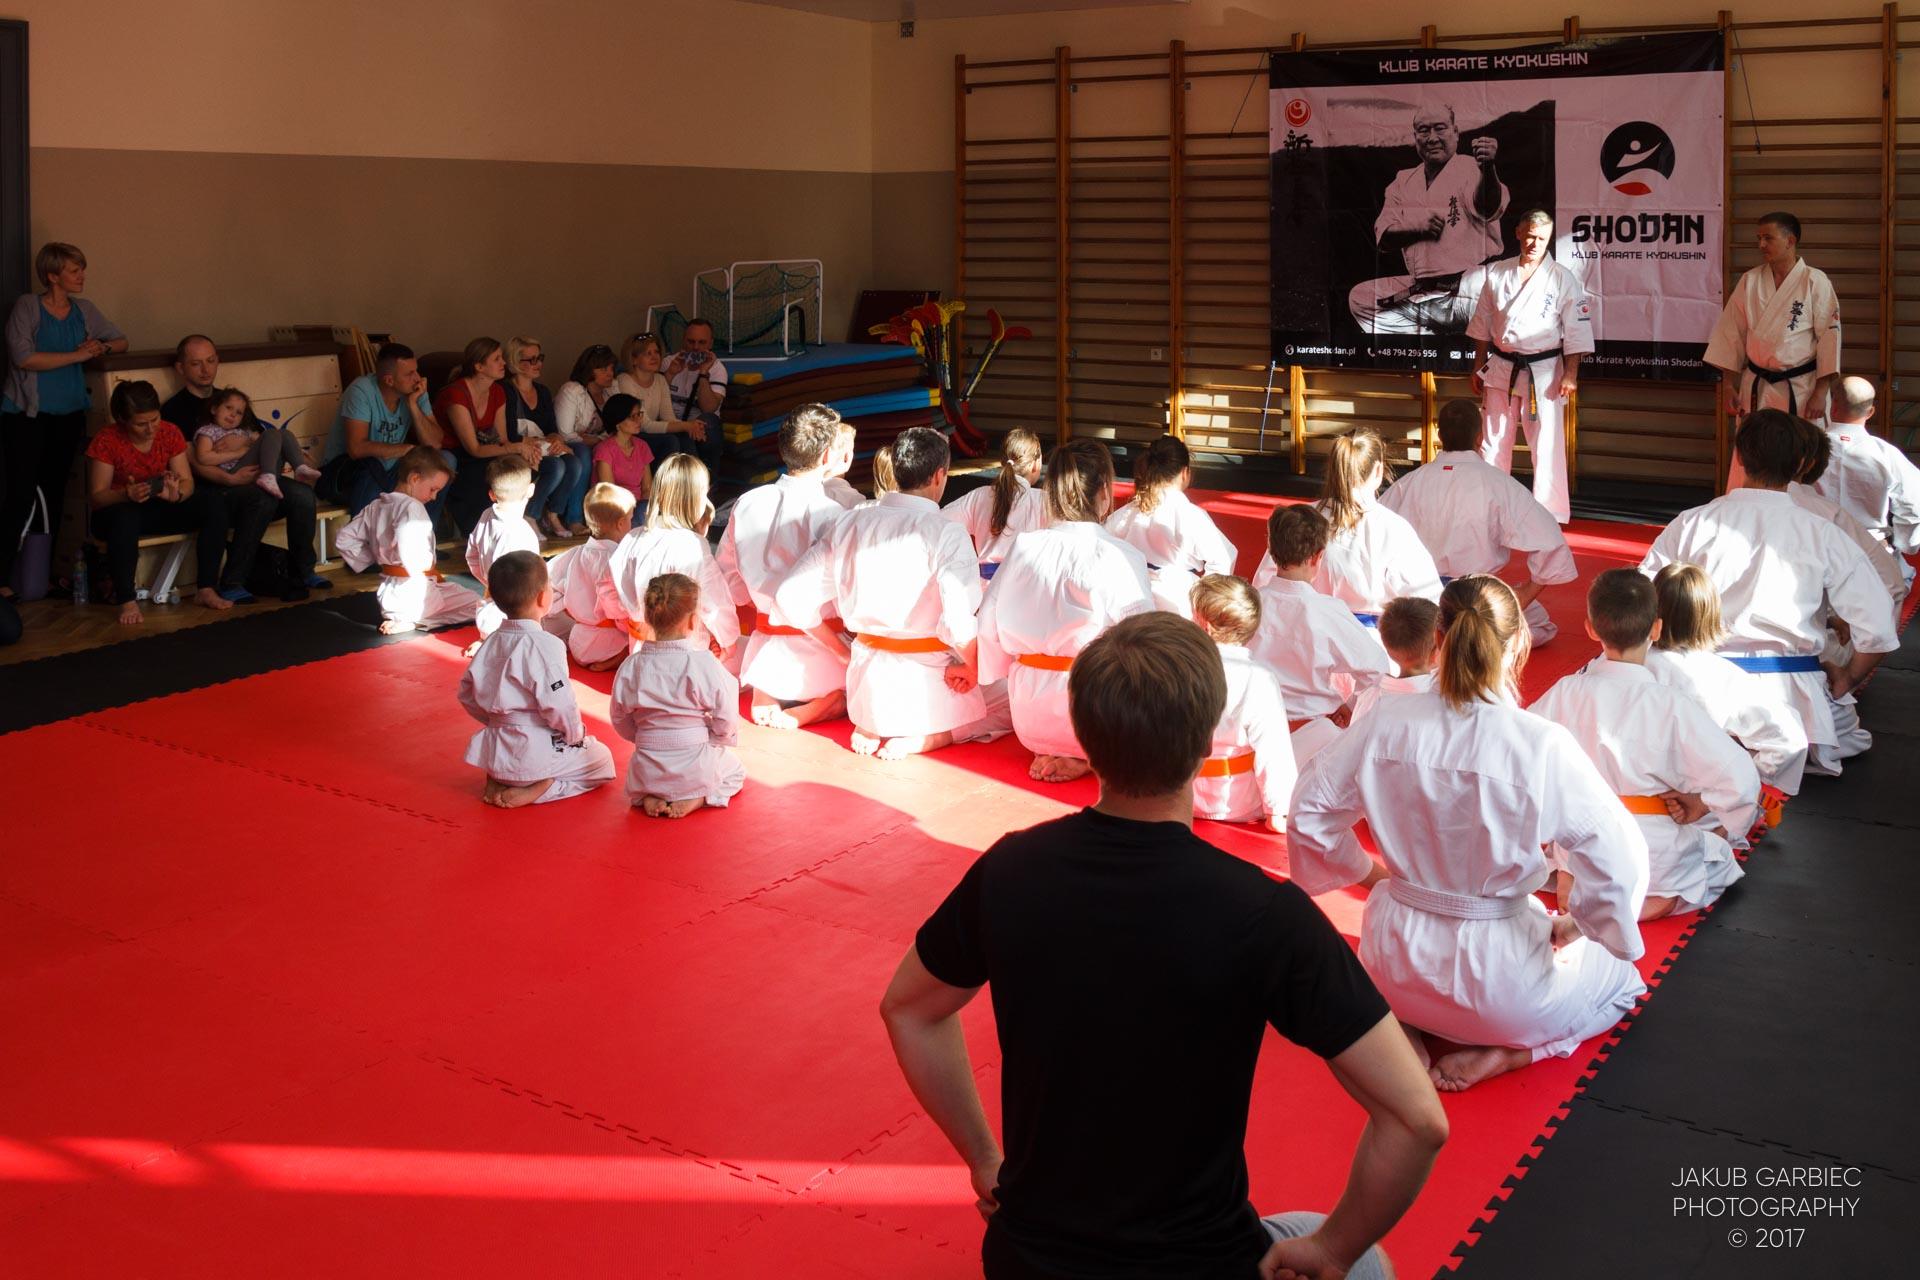 egzamin-karate-mistrz-maciej-mazur-klub-shodan-2017-06-02-3